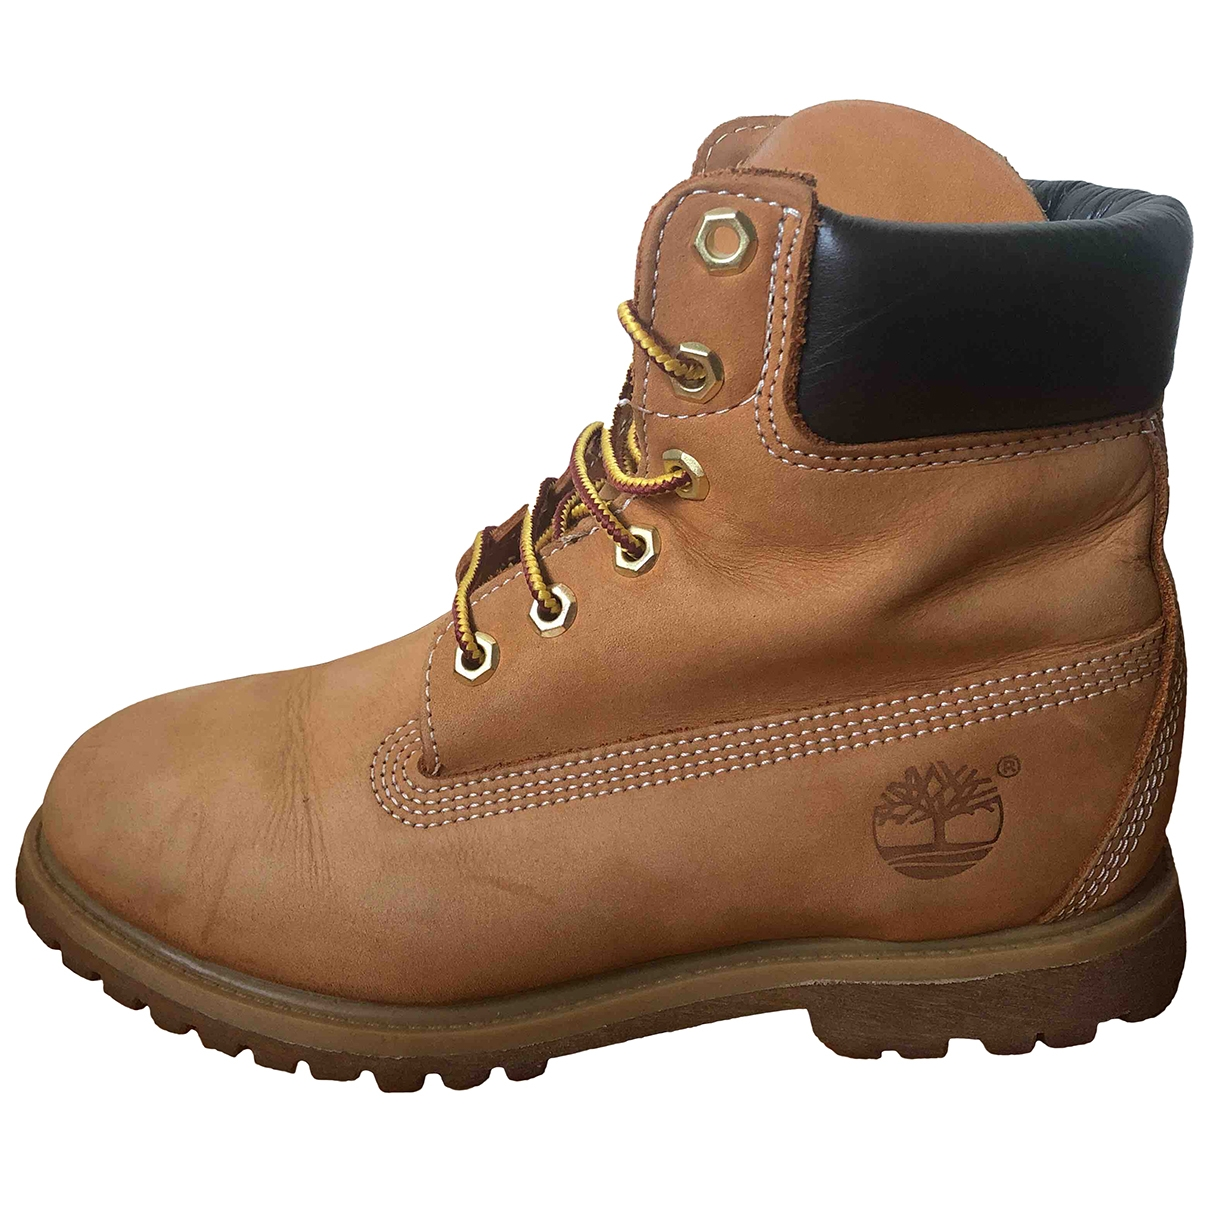 Timberland - Boots   pour femme en cuir